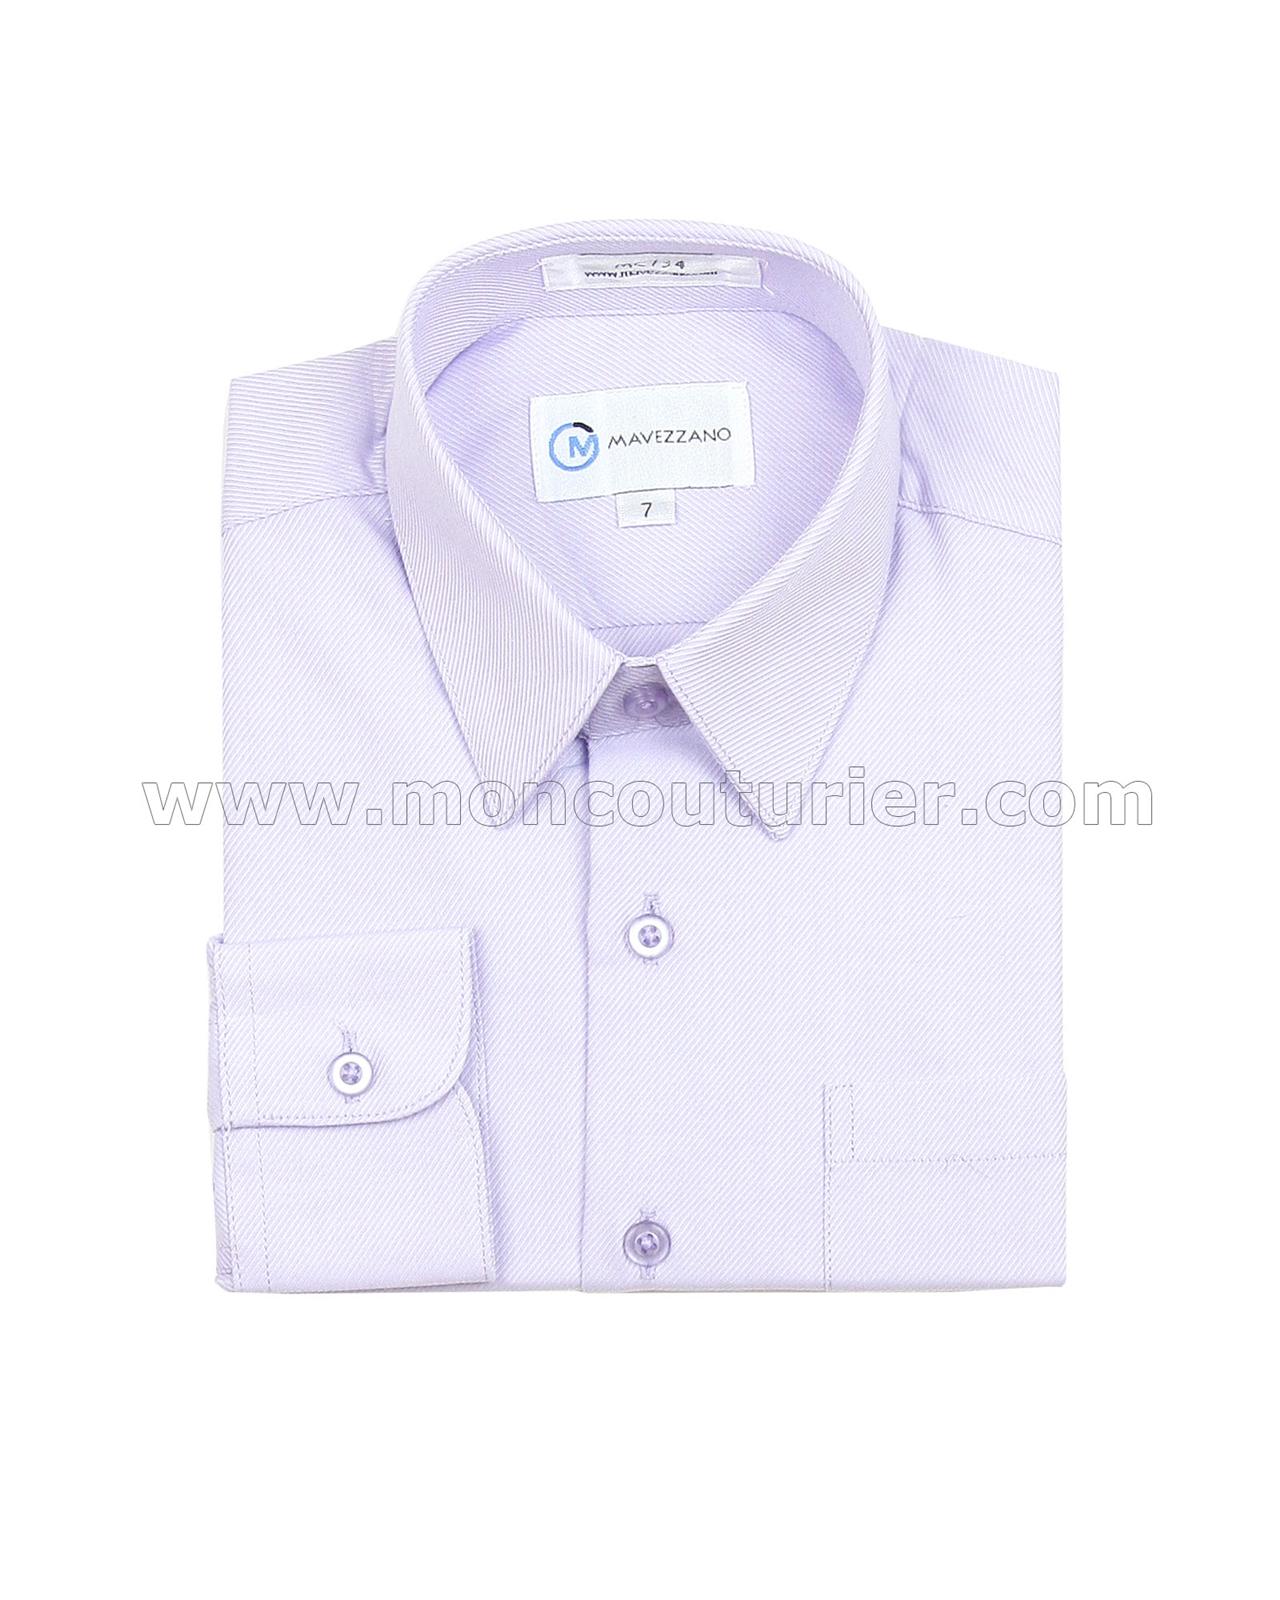 Mavezzano Dress Shirt In Lavender